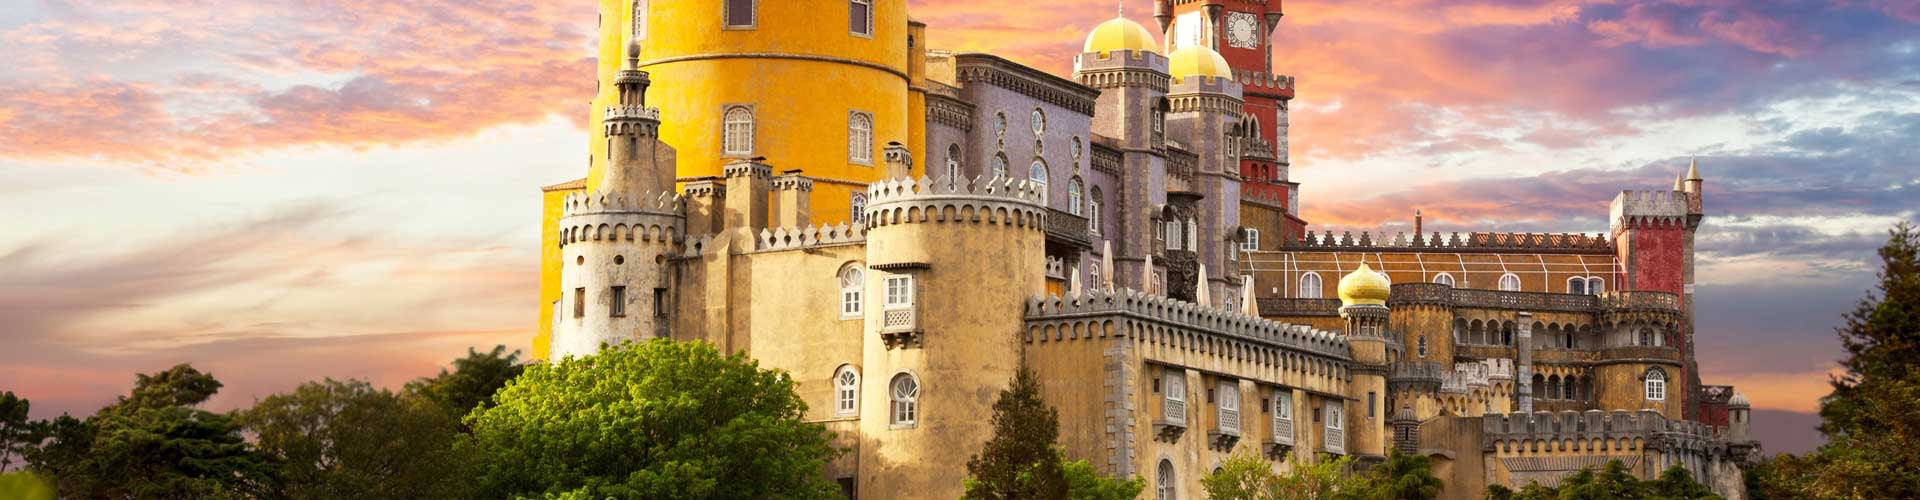 Tour Sintra Cascais Estoril Palacio Da Pena 2020